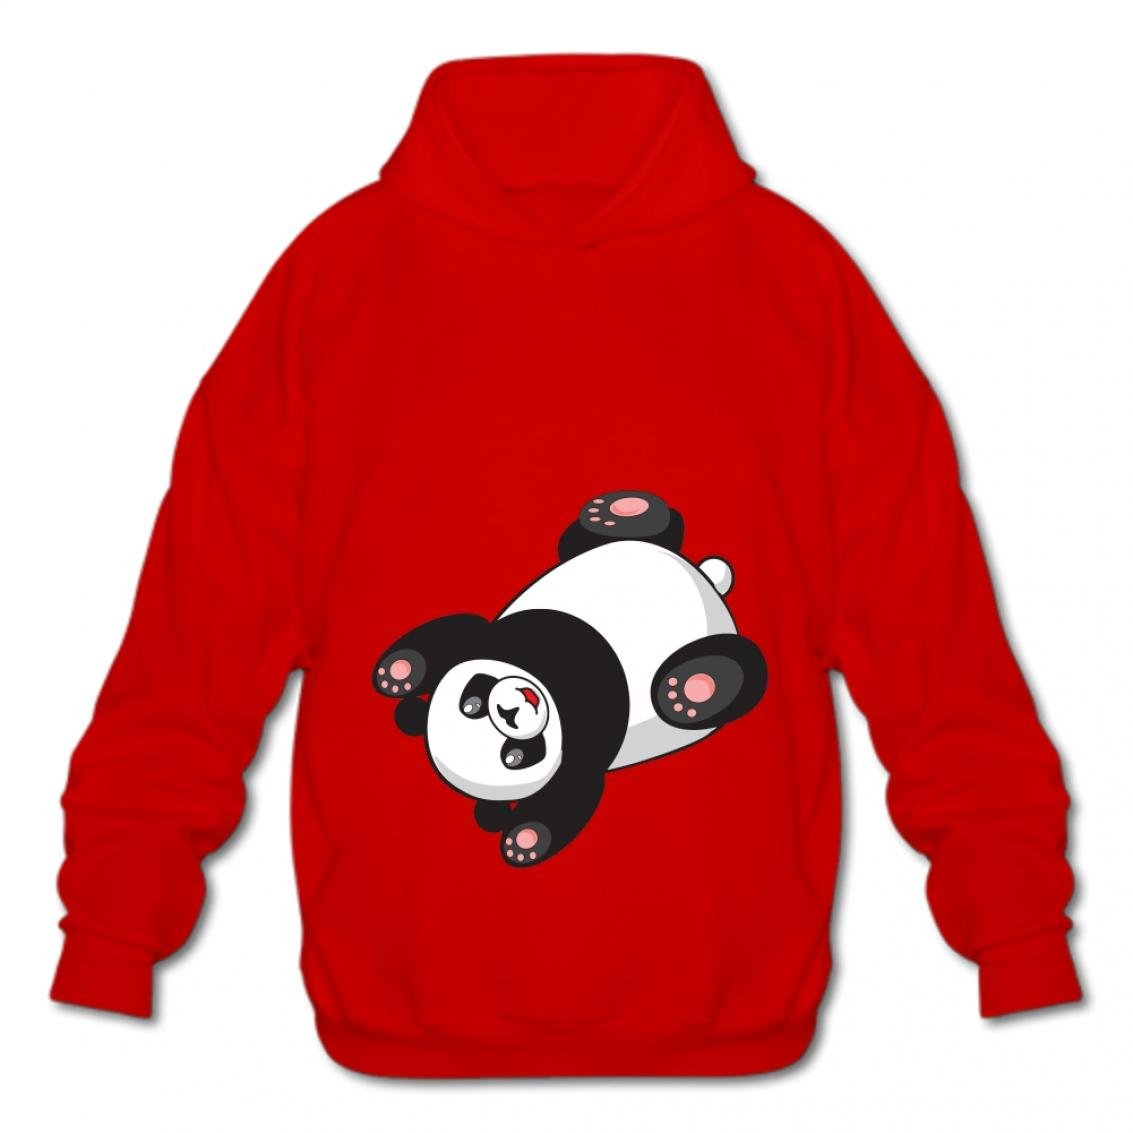 Gnshuiquji Mens Cotton Pullover Fashion Sweatshirts Fashion Hoodies-03 Cartoon Panda Nnel Hooded